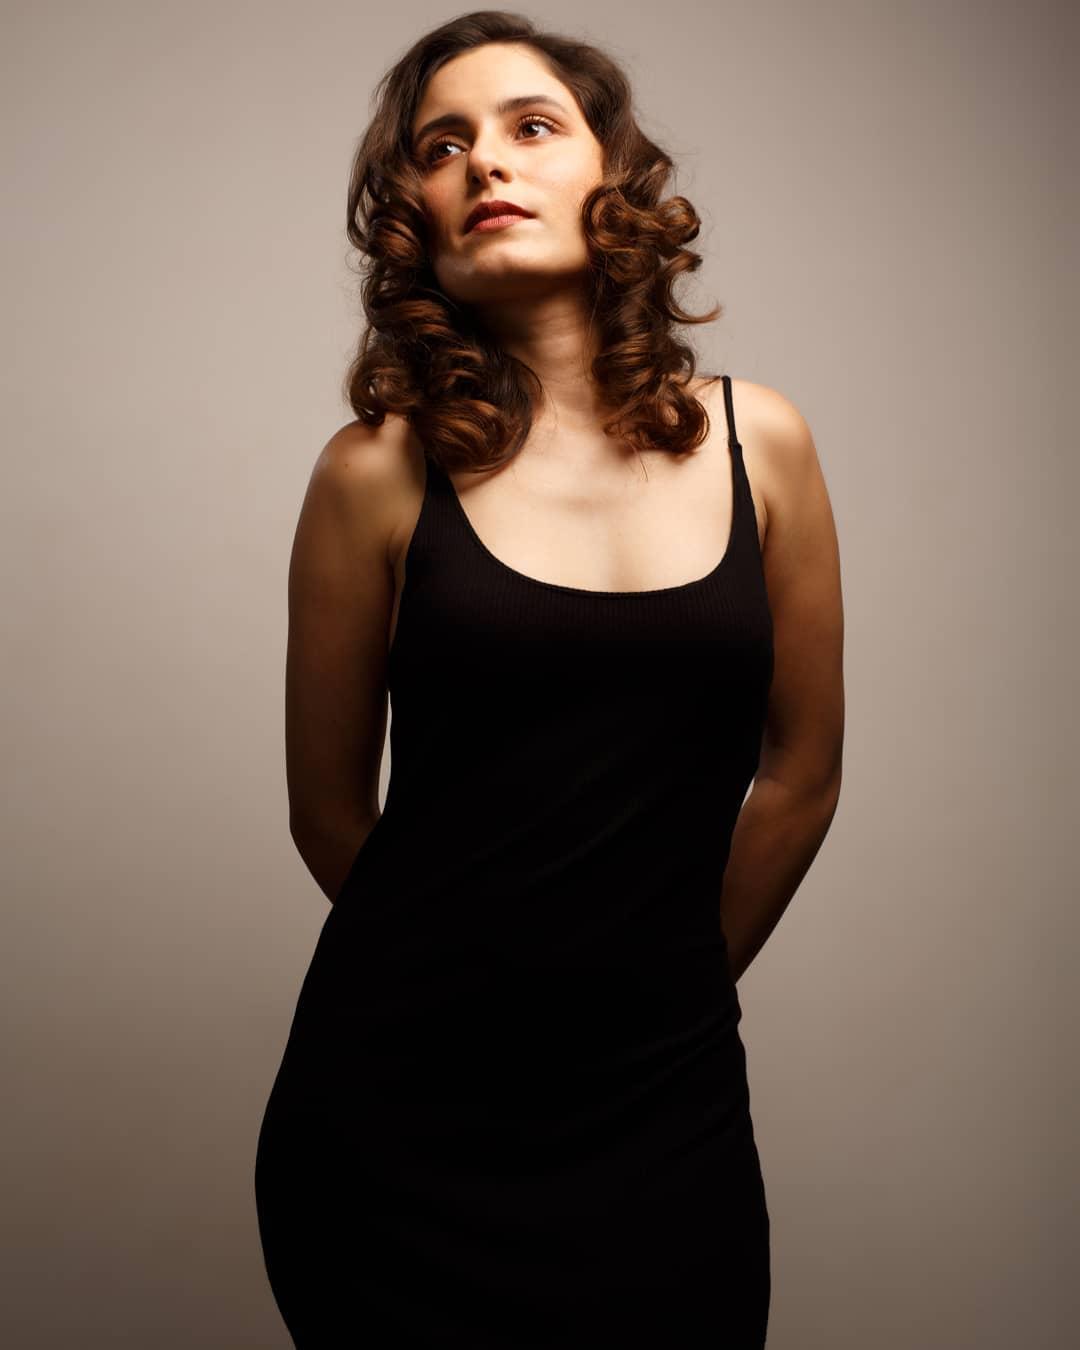 Ann Alexia Anra left acting